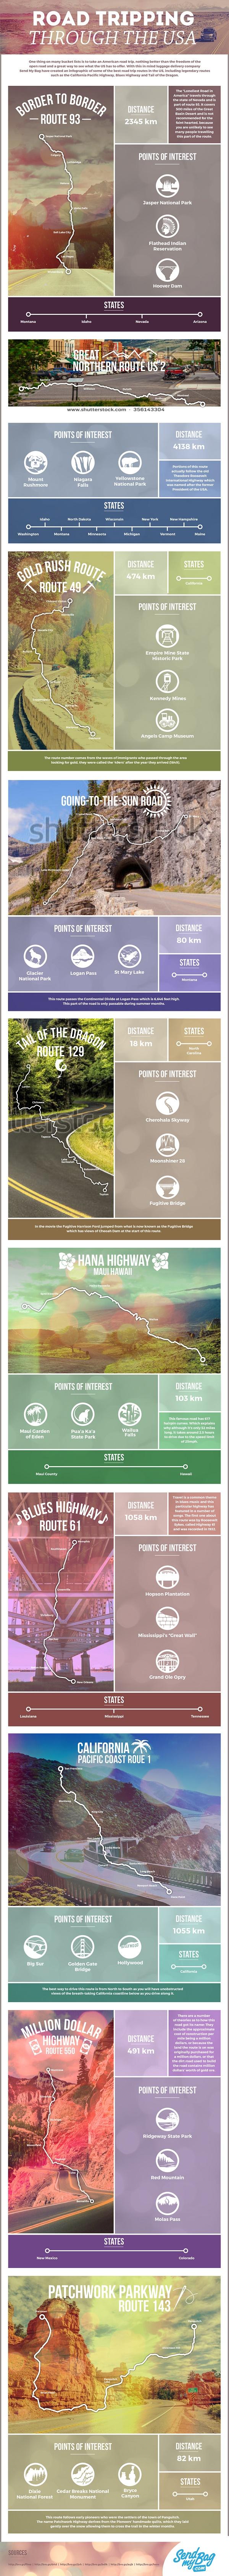 US roadtrip infographic